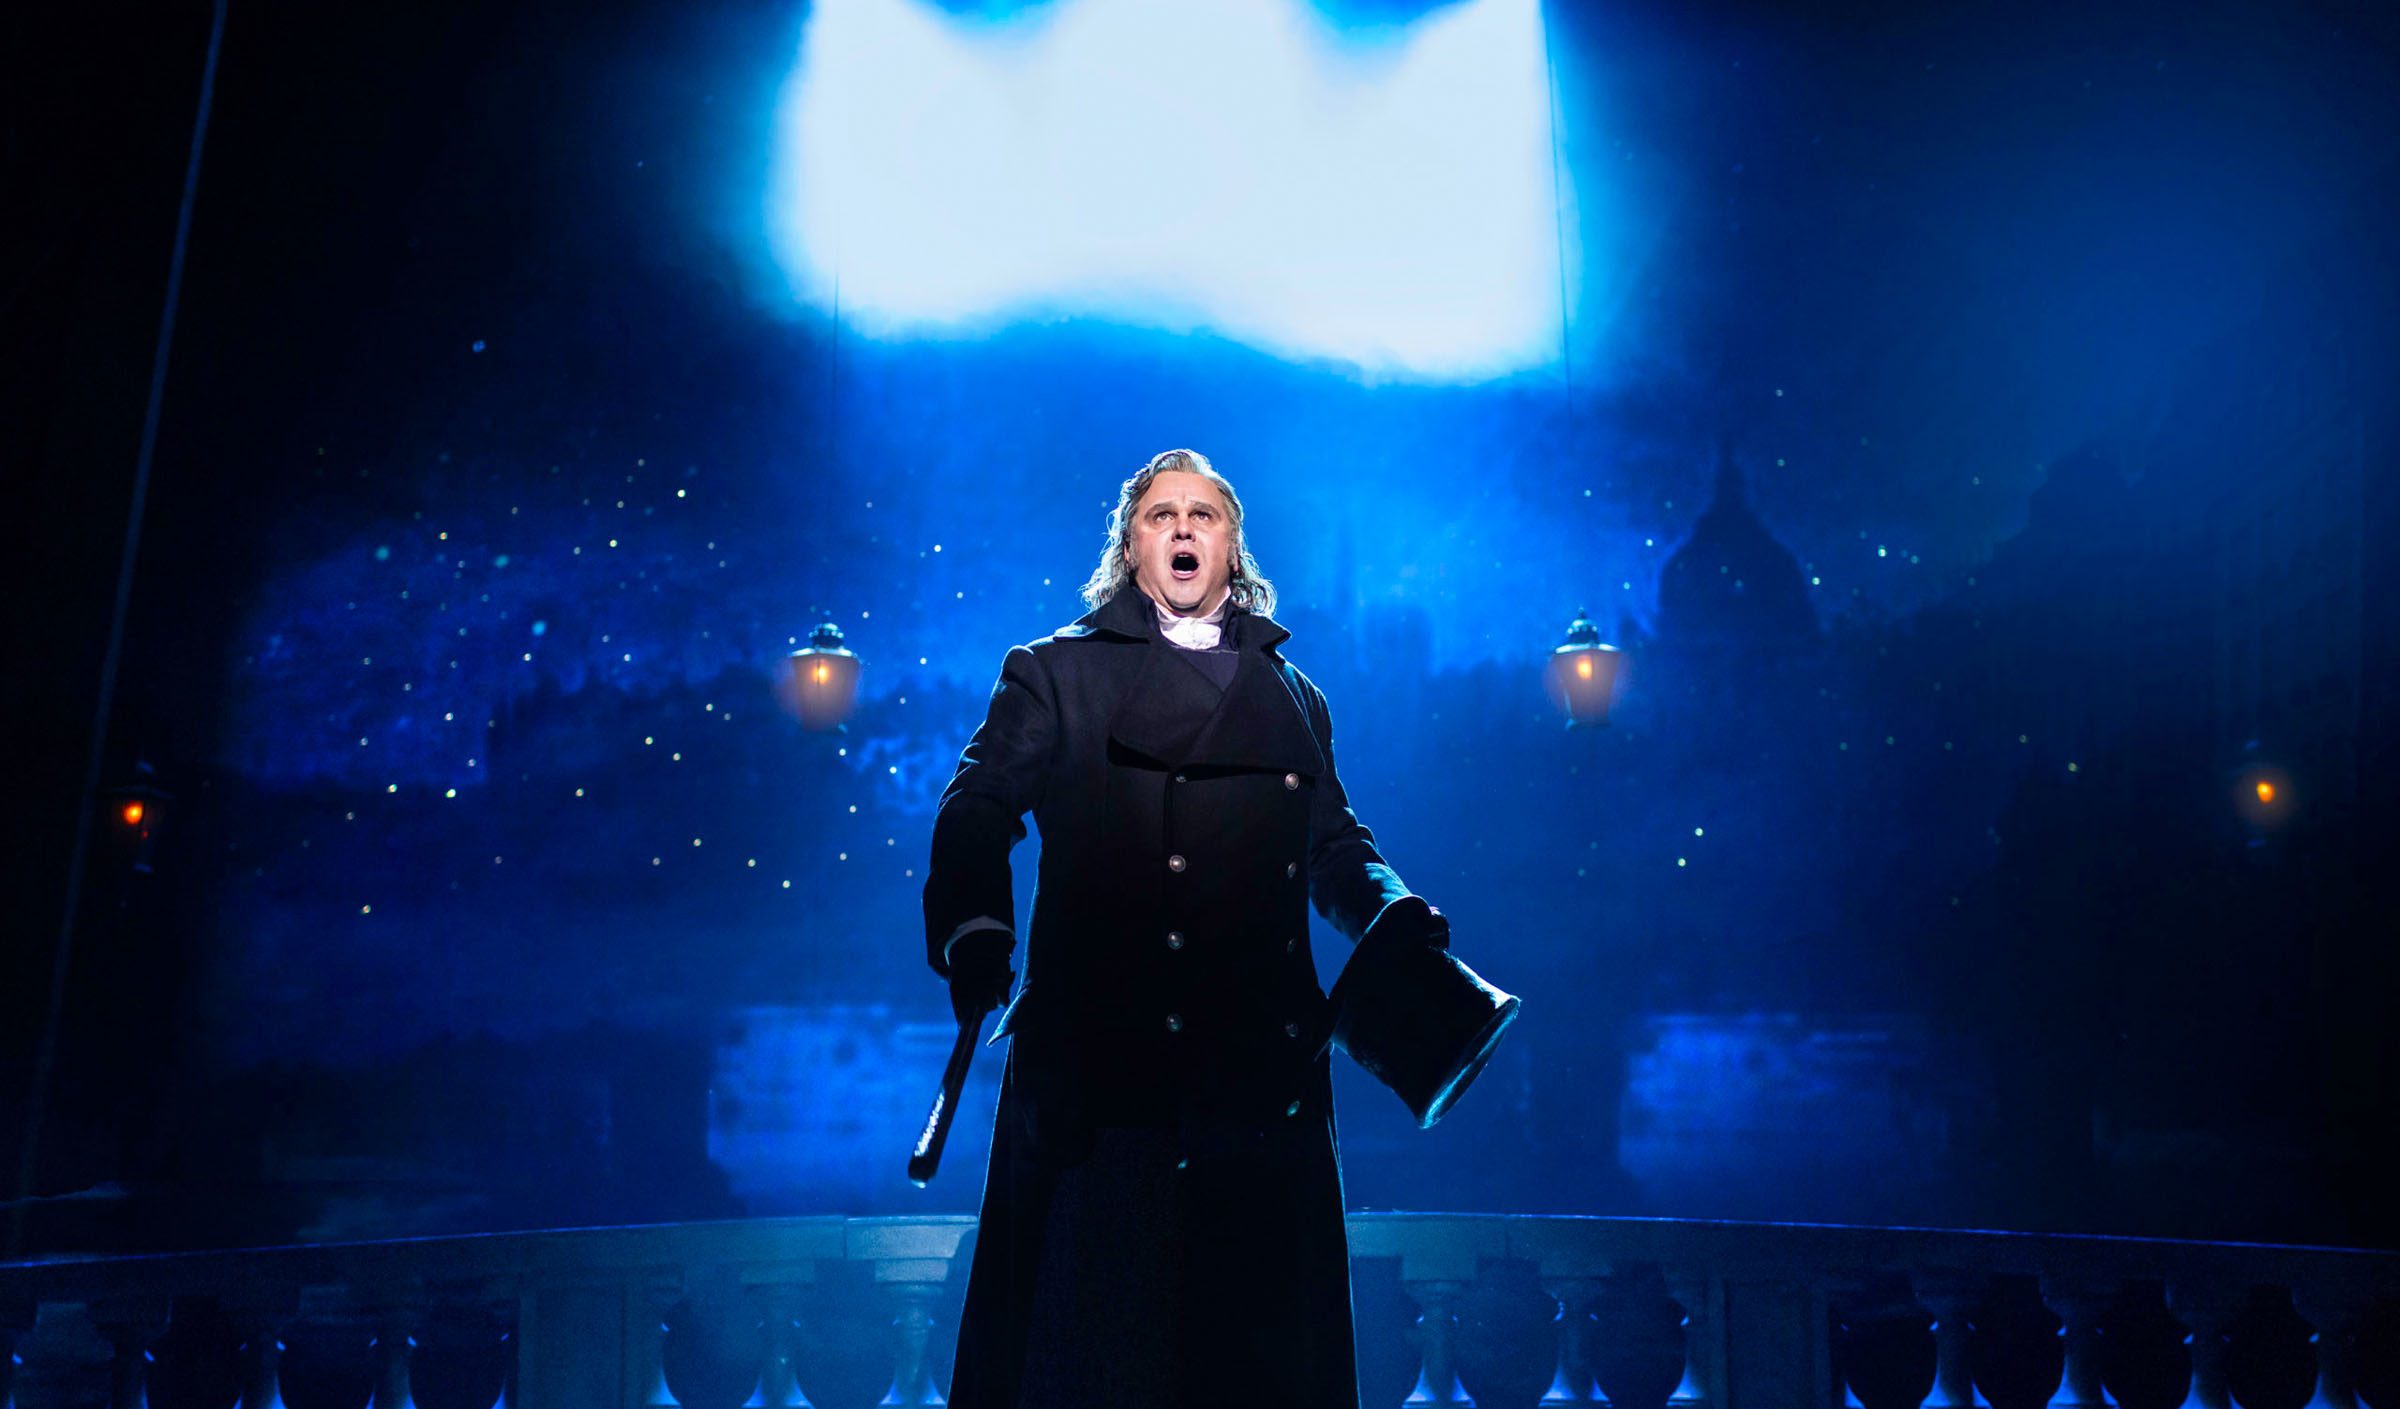 Nic Greenshields as Javert in Les Misérables UK and Ireland Tour